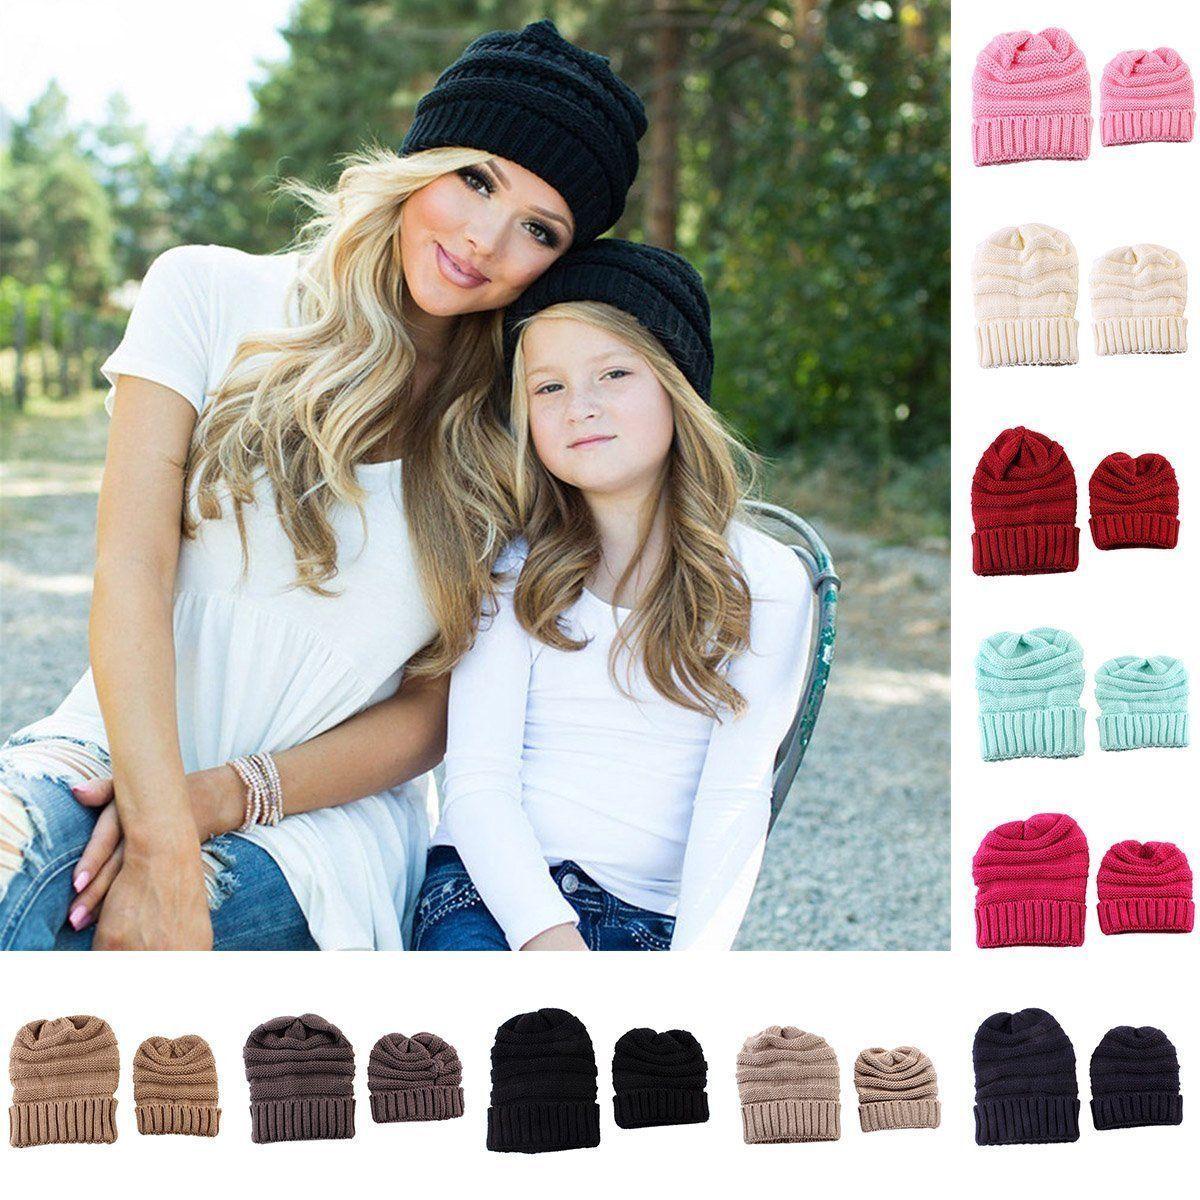 40fe81f7b 2Pcs Women Mother & Baby Child Warm Winter Knit Beanie Baggy Hat ...